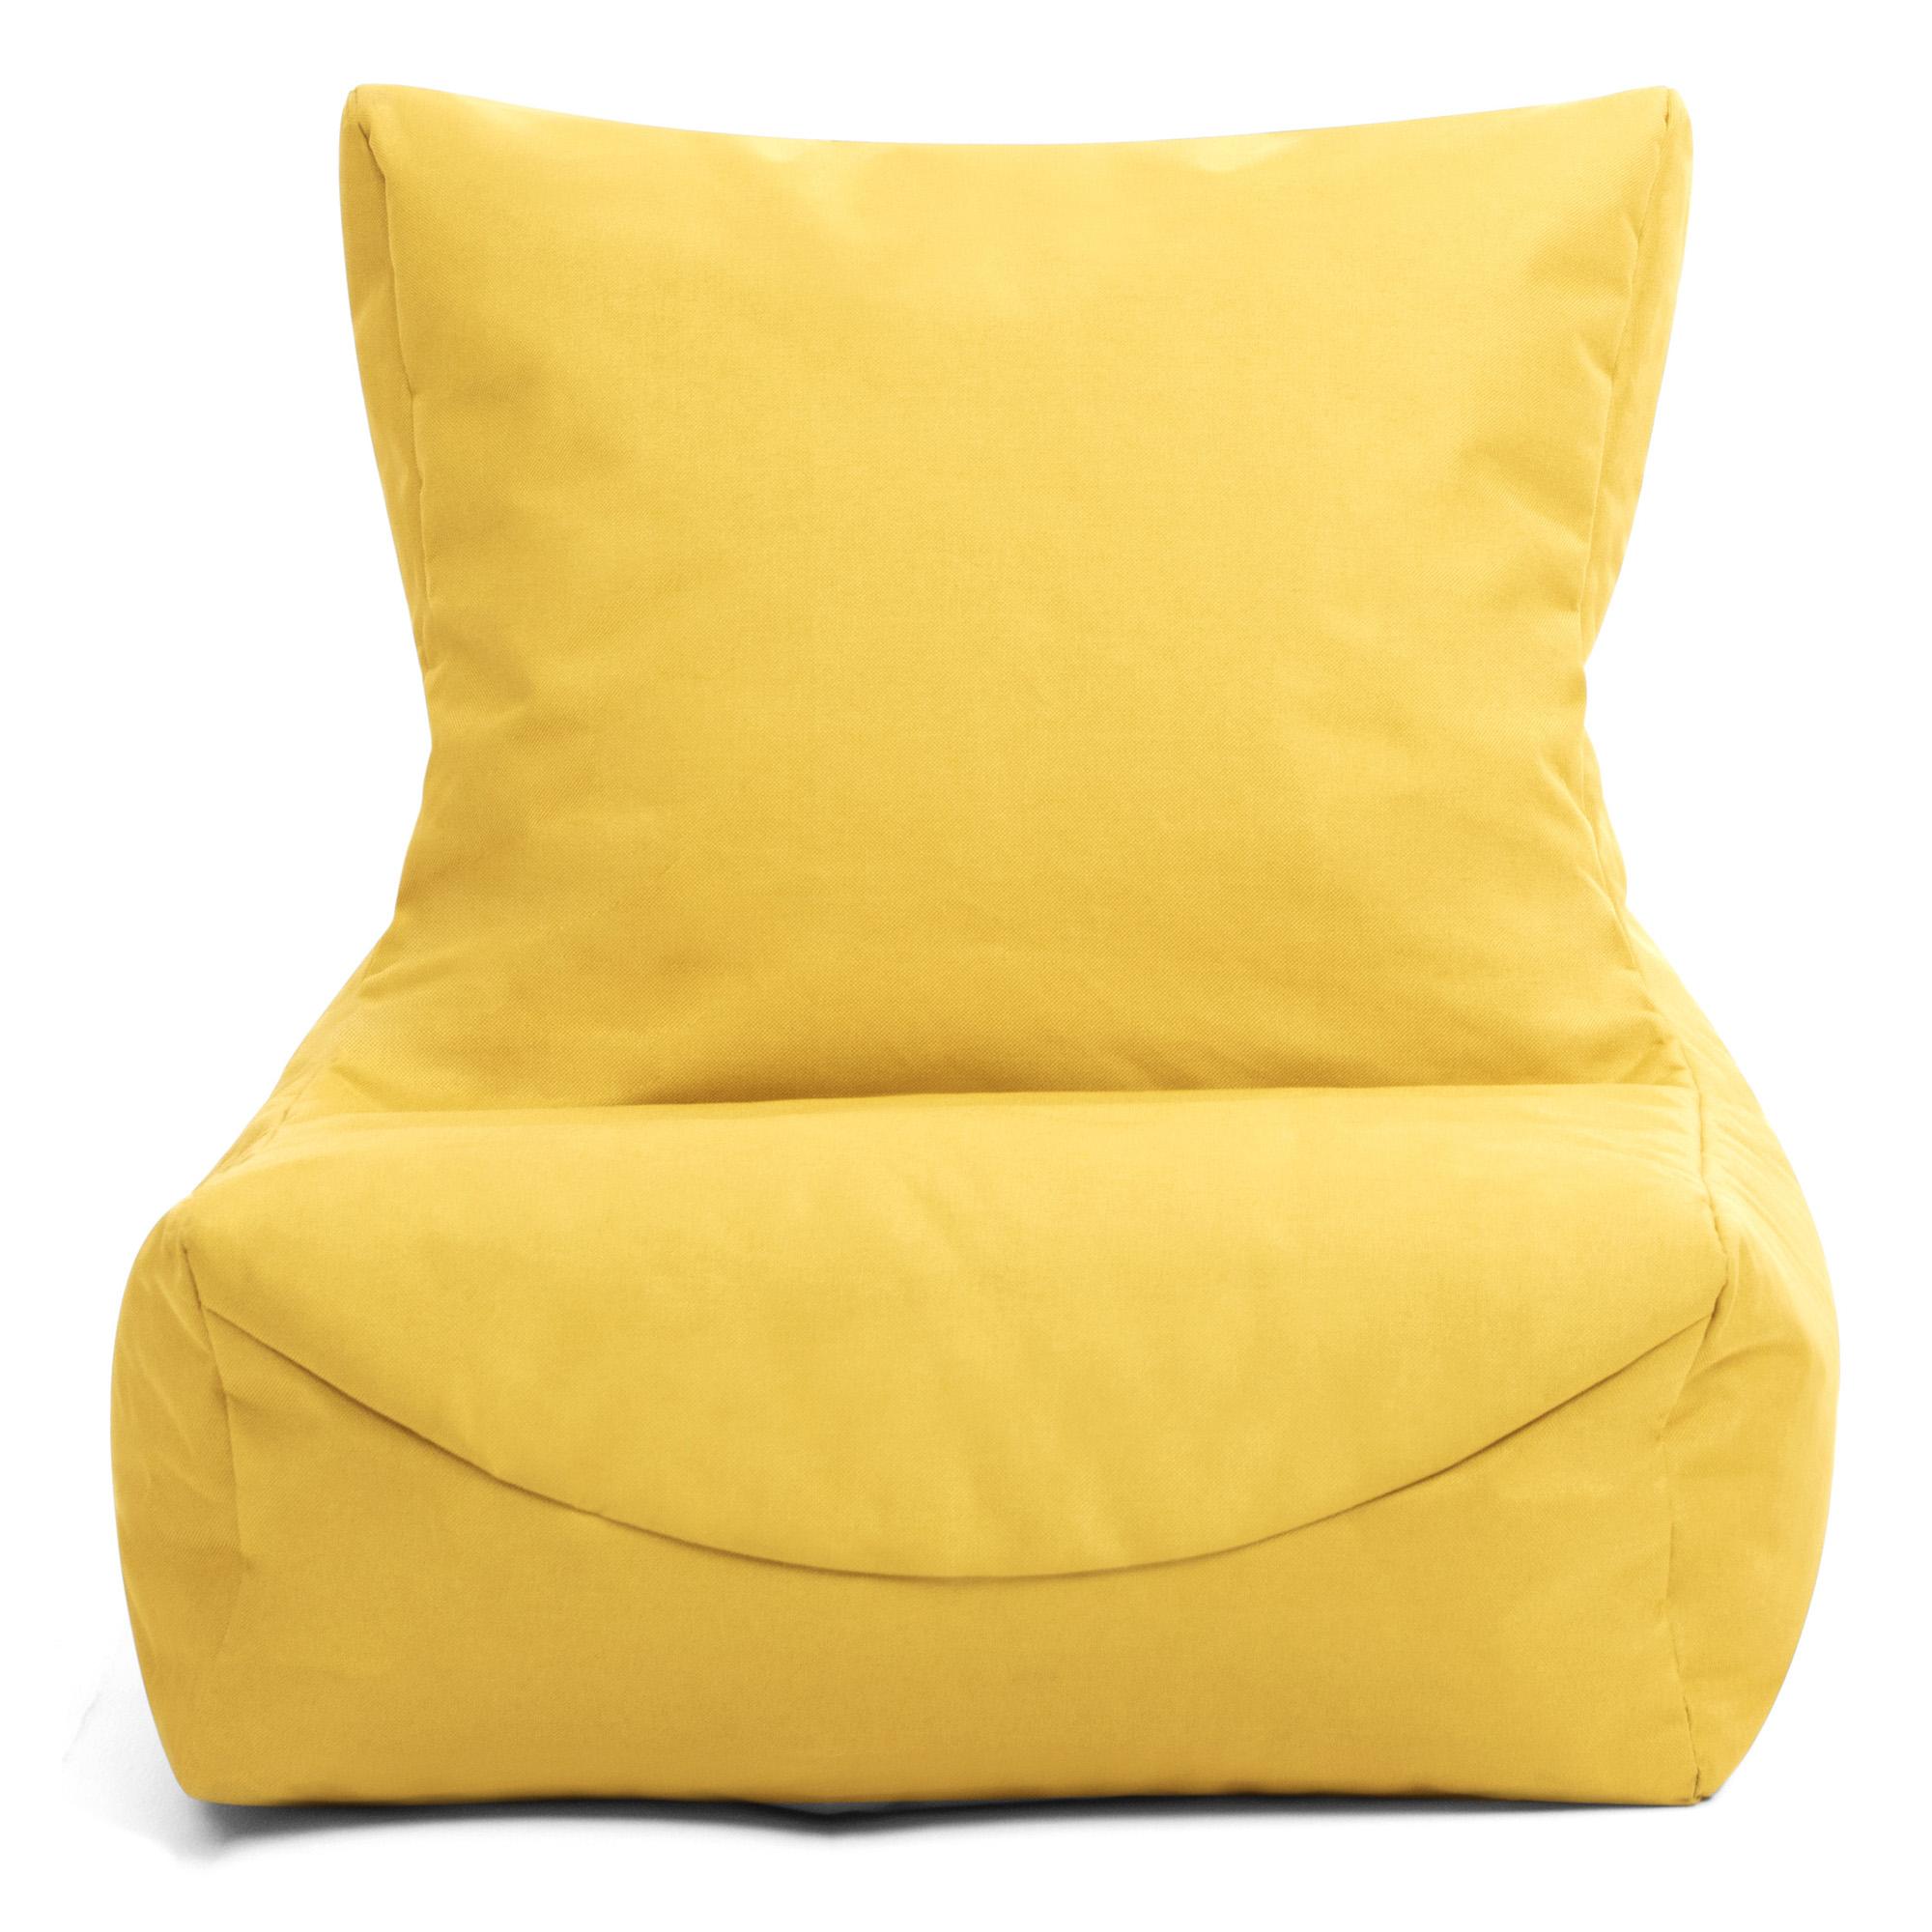 Eden-PRI-Smile-Chair-Mustard-1-300dpi